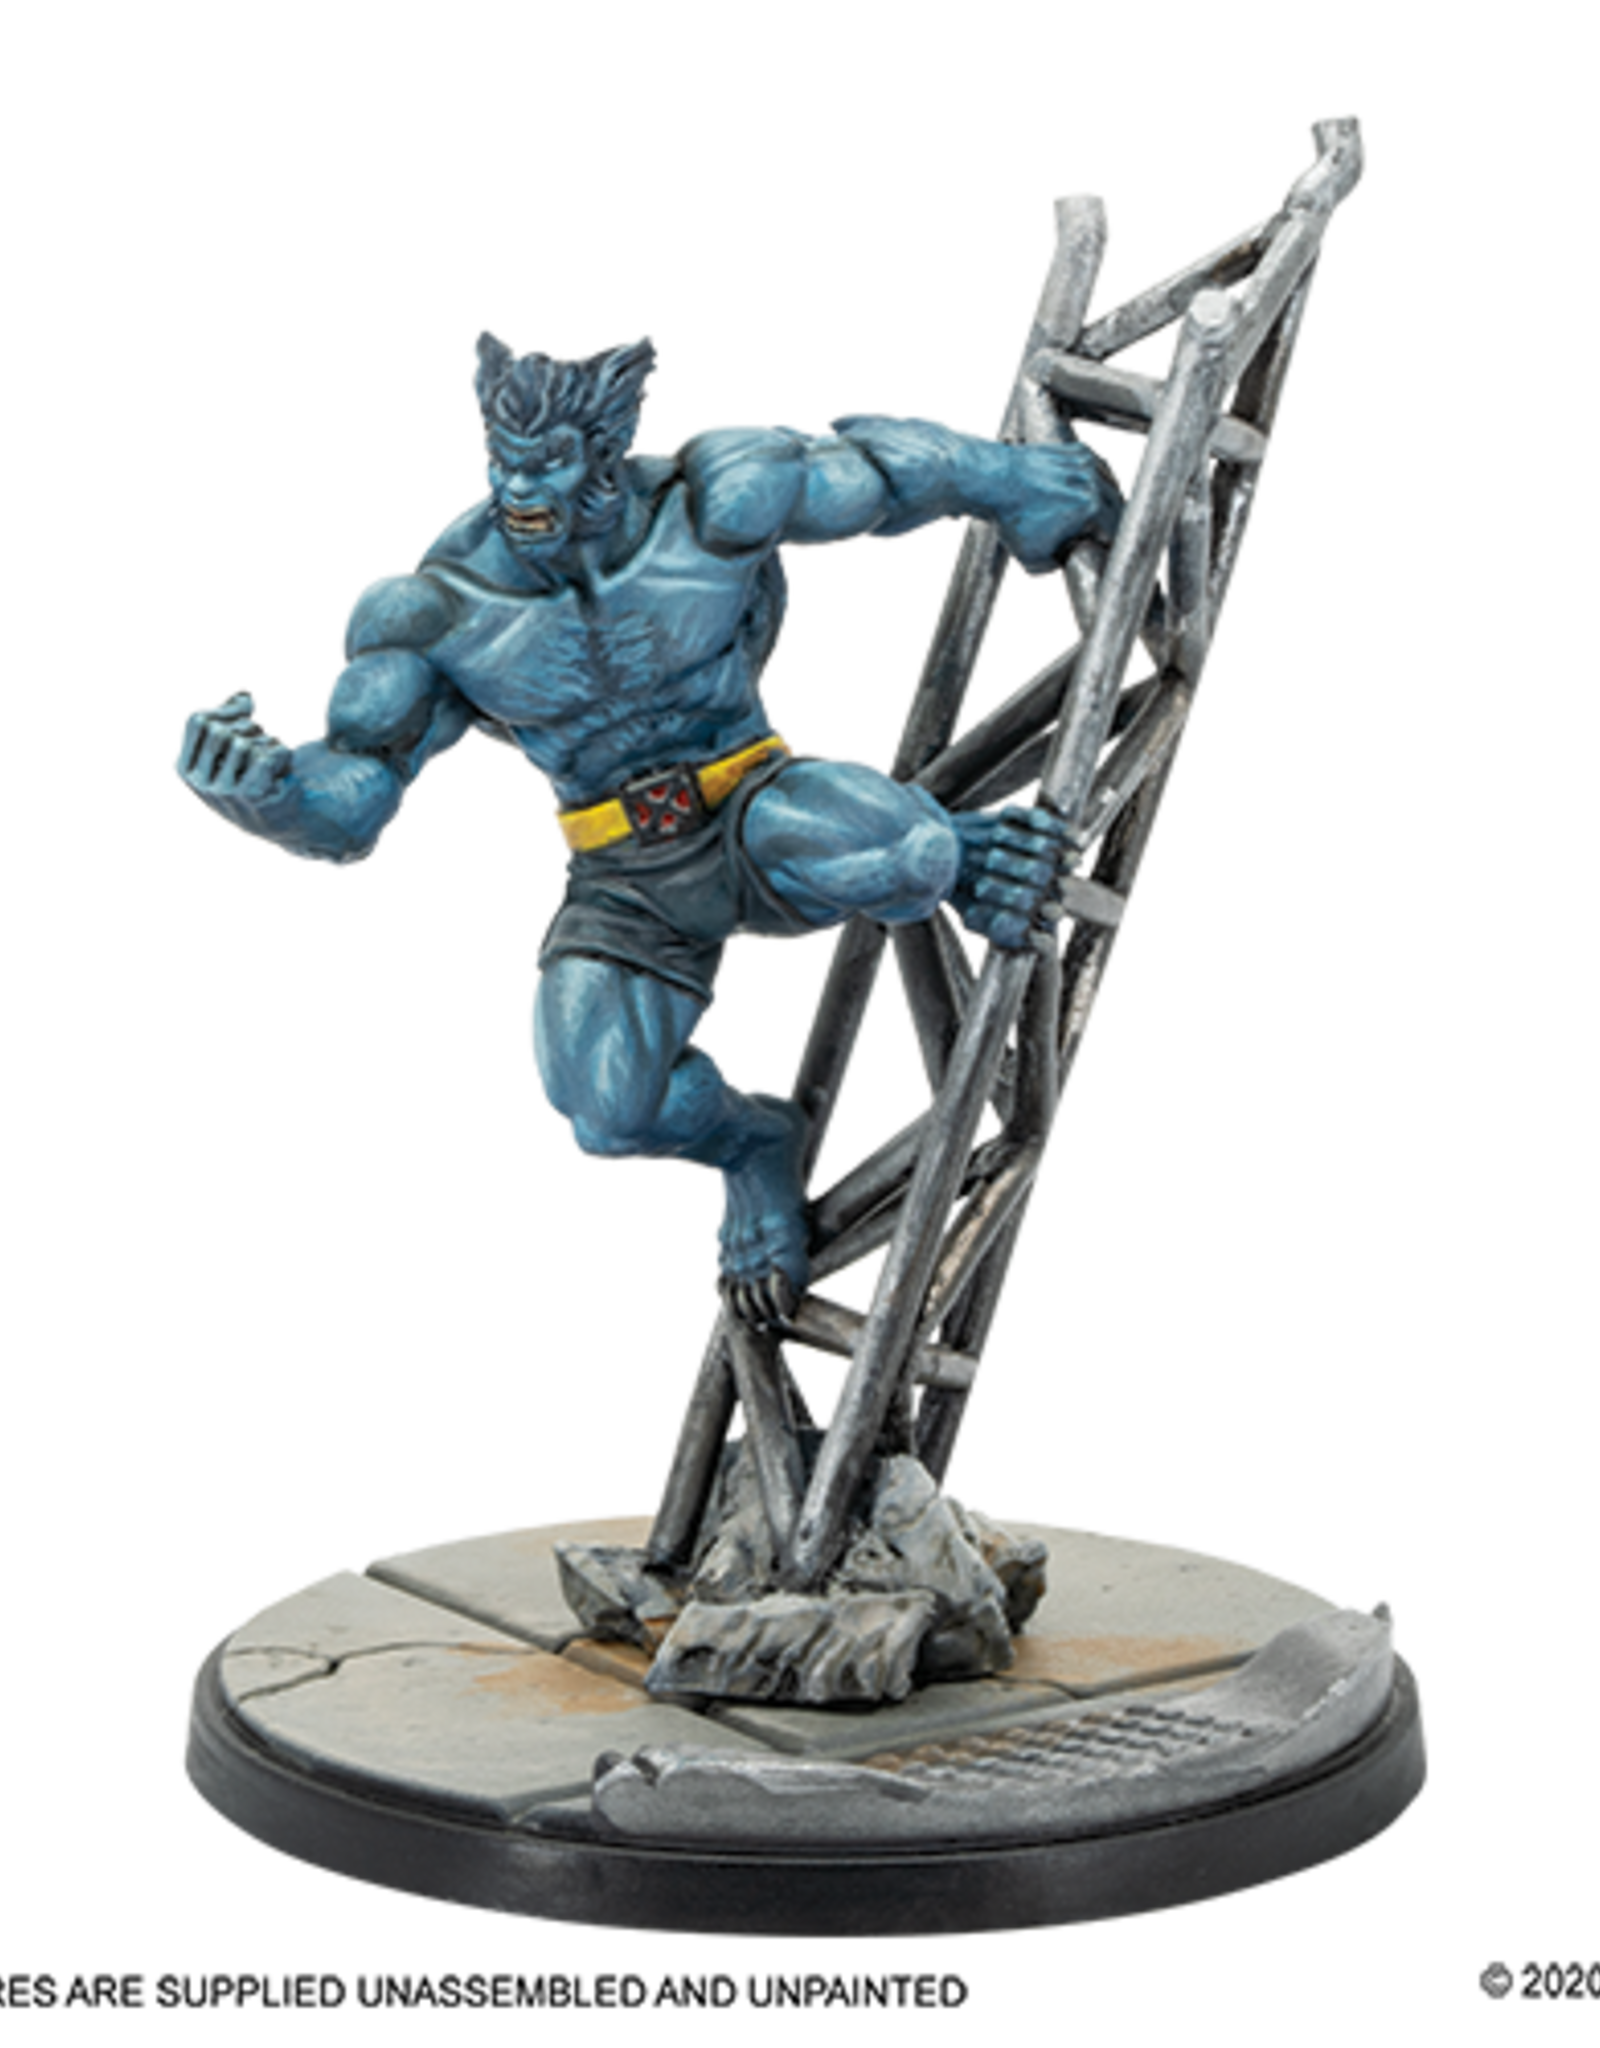 Atomic Mass Marvel Crisis Protocol: Mystique and Beast